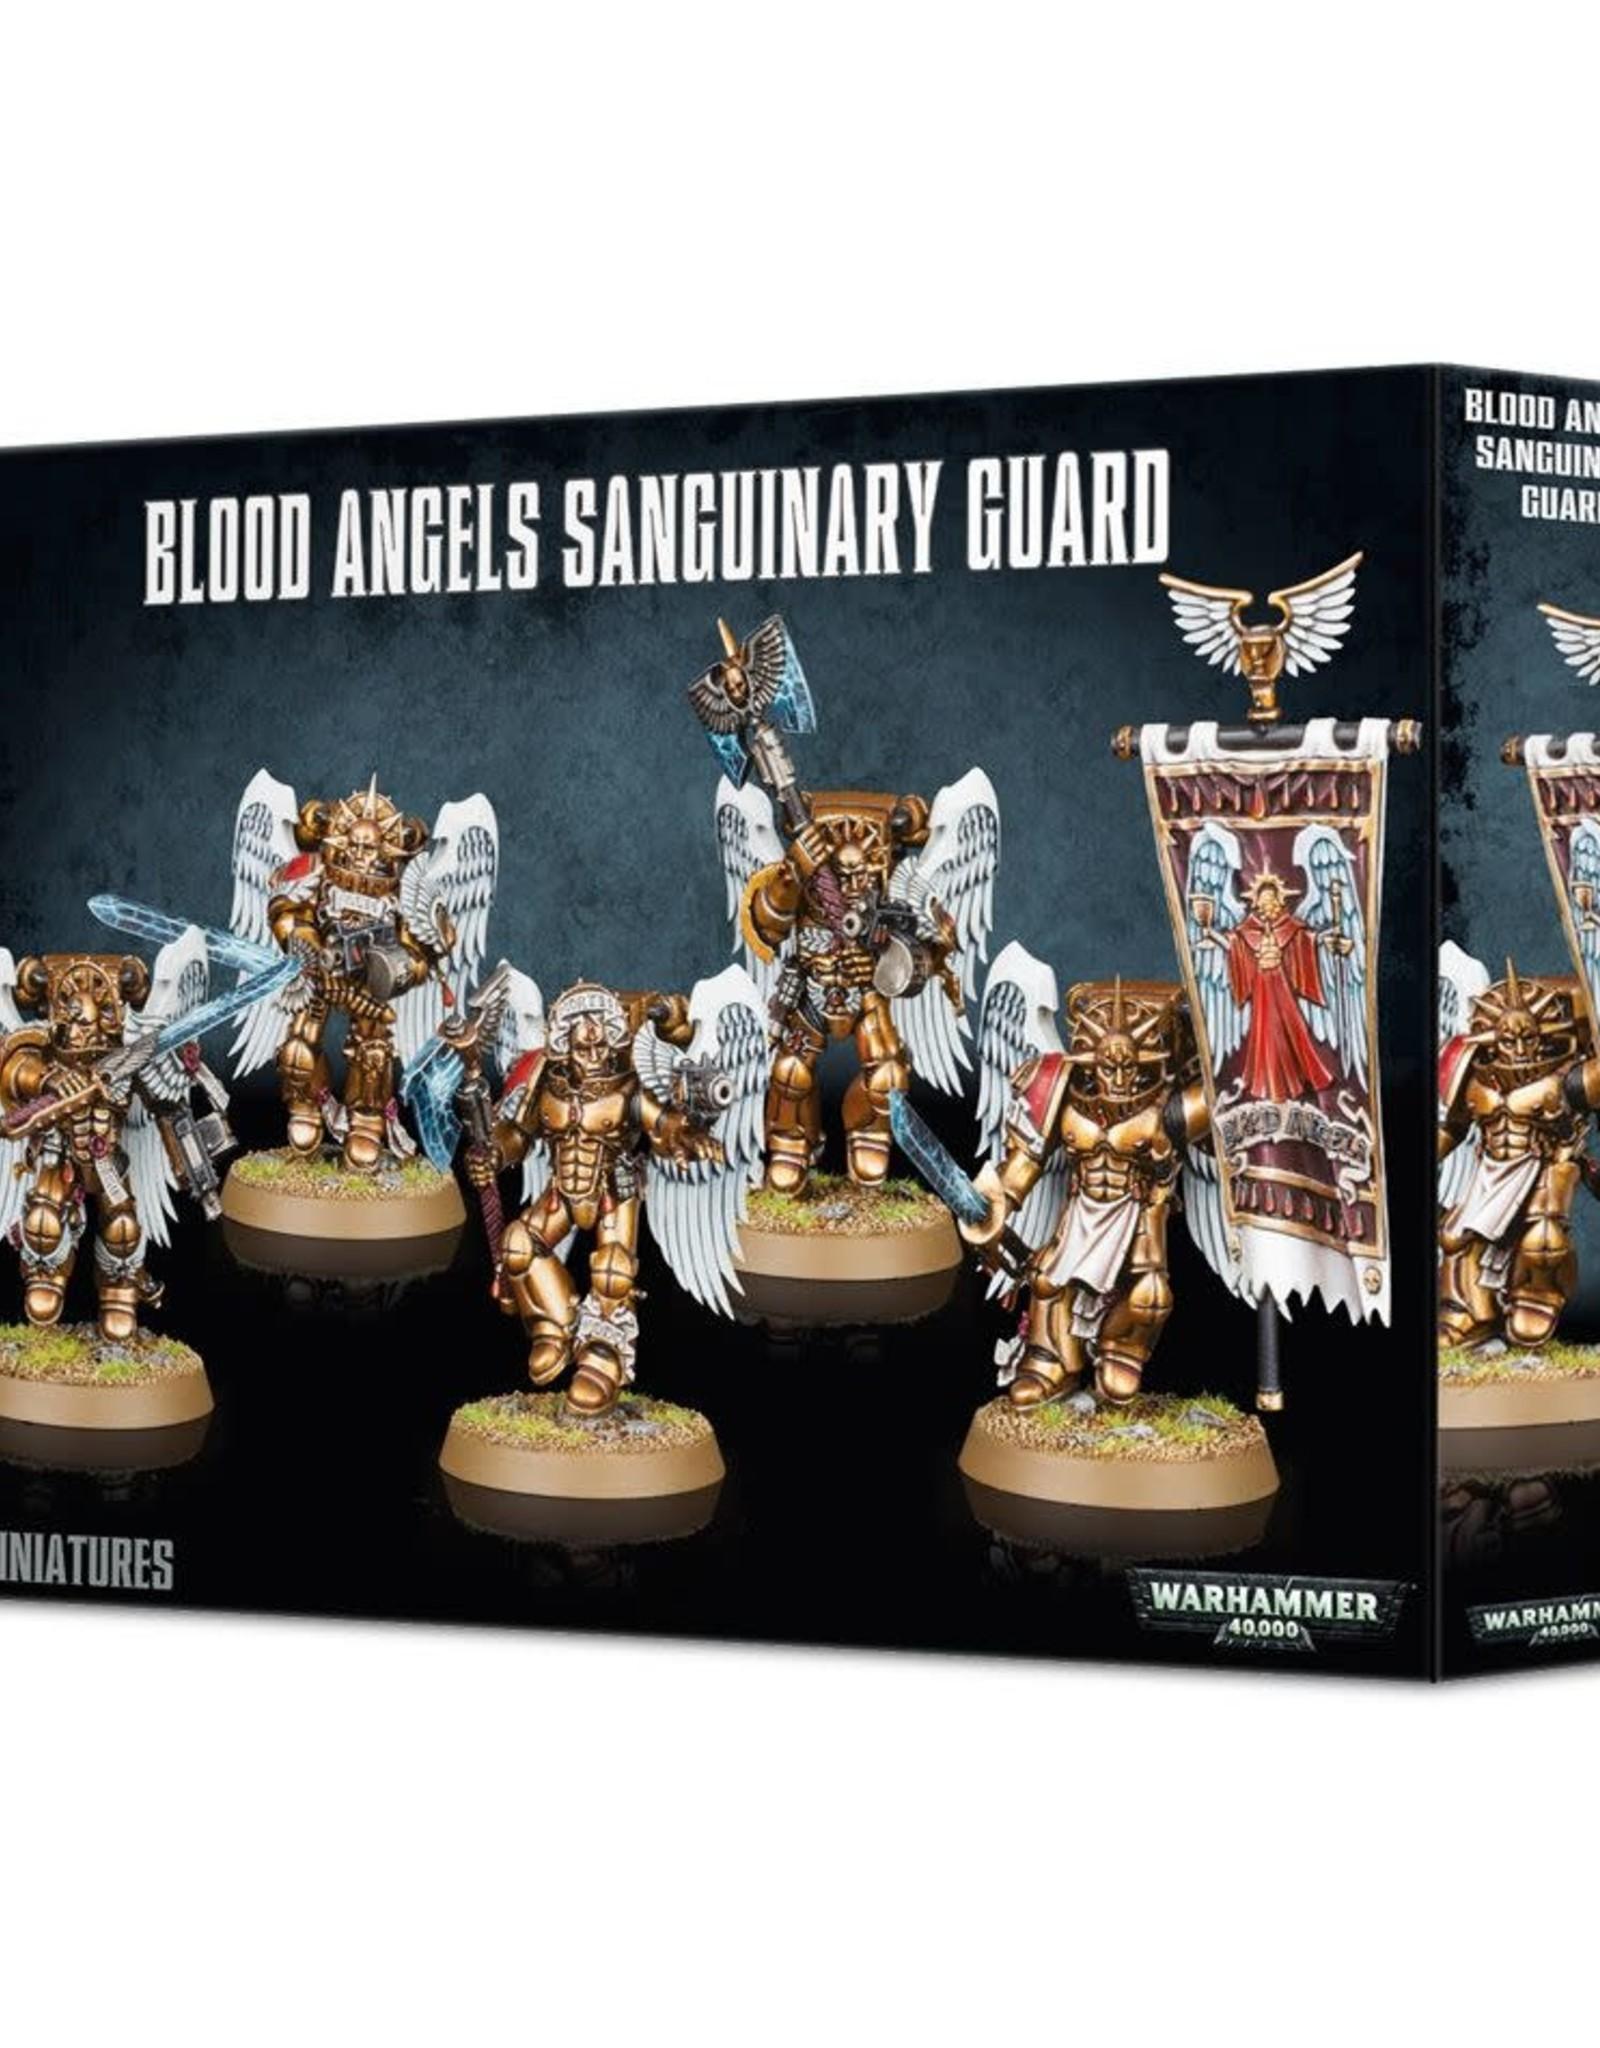 Warhammer 40K Blood Angels Sanguinary Guard